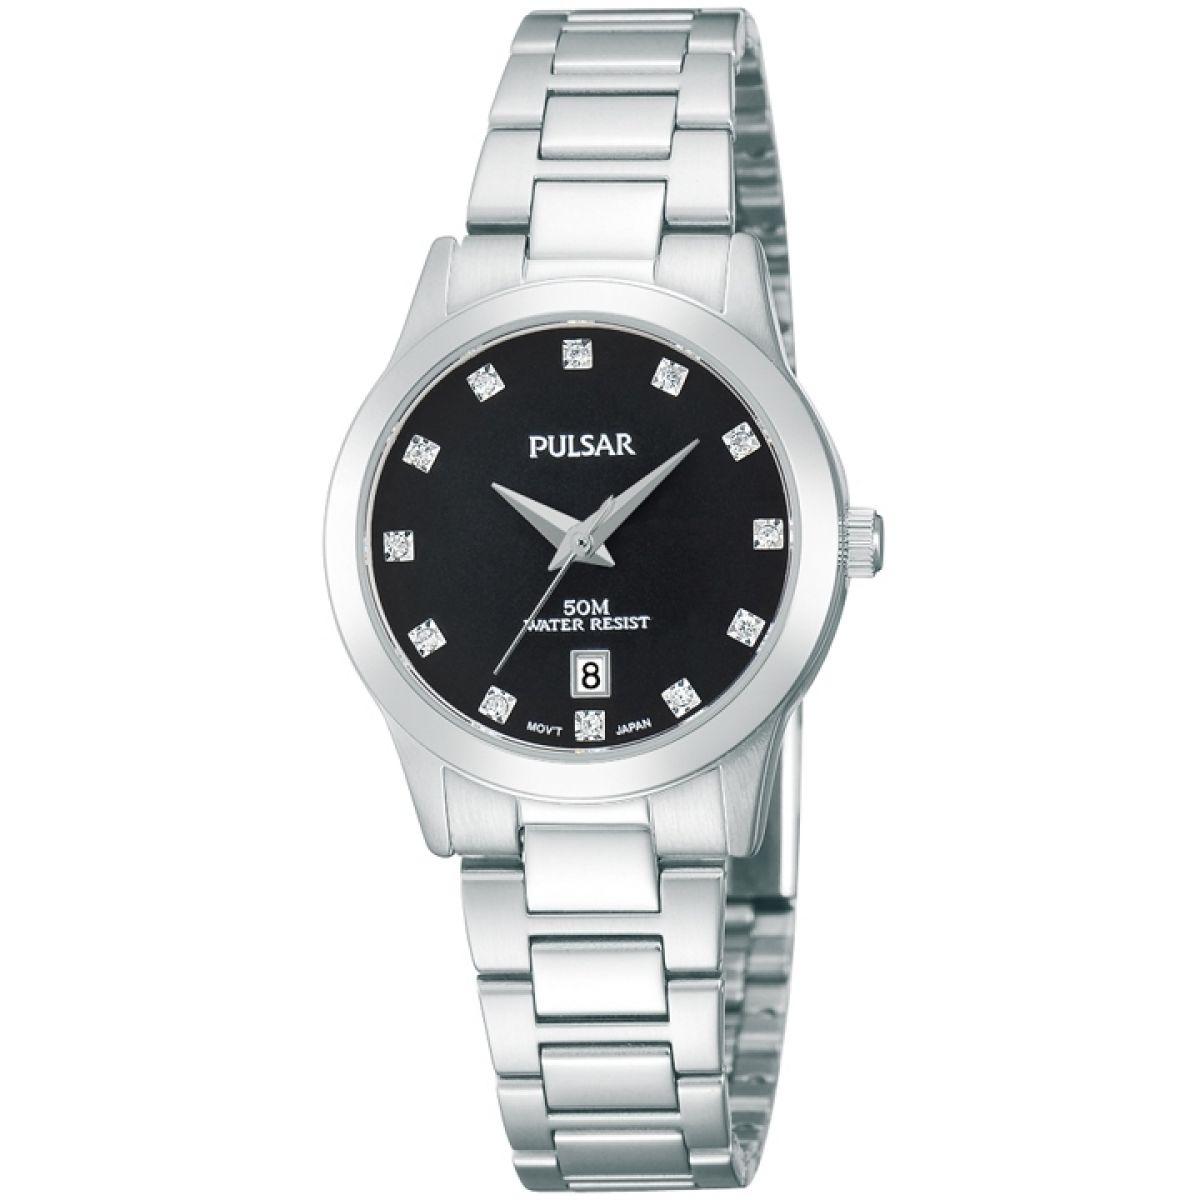 Ex-Display Pulsar Ladies Stainless Steel Quartz Watch PH7277X1-PNP 50M WR, Swarovski Hour Markers, £24.99 @ Rubicon Watches